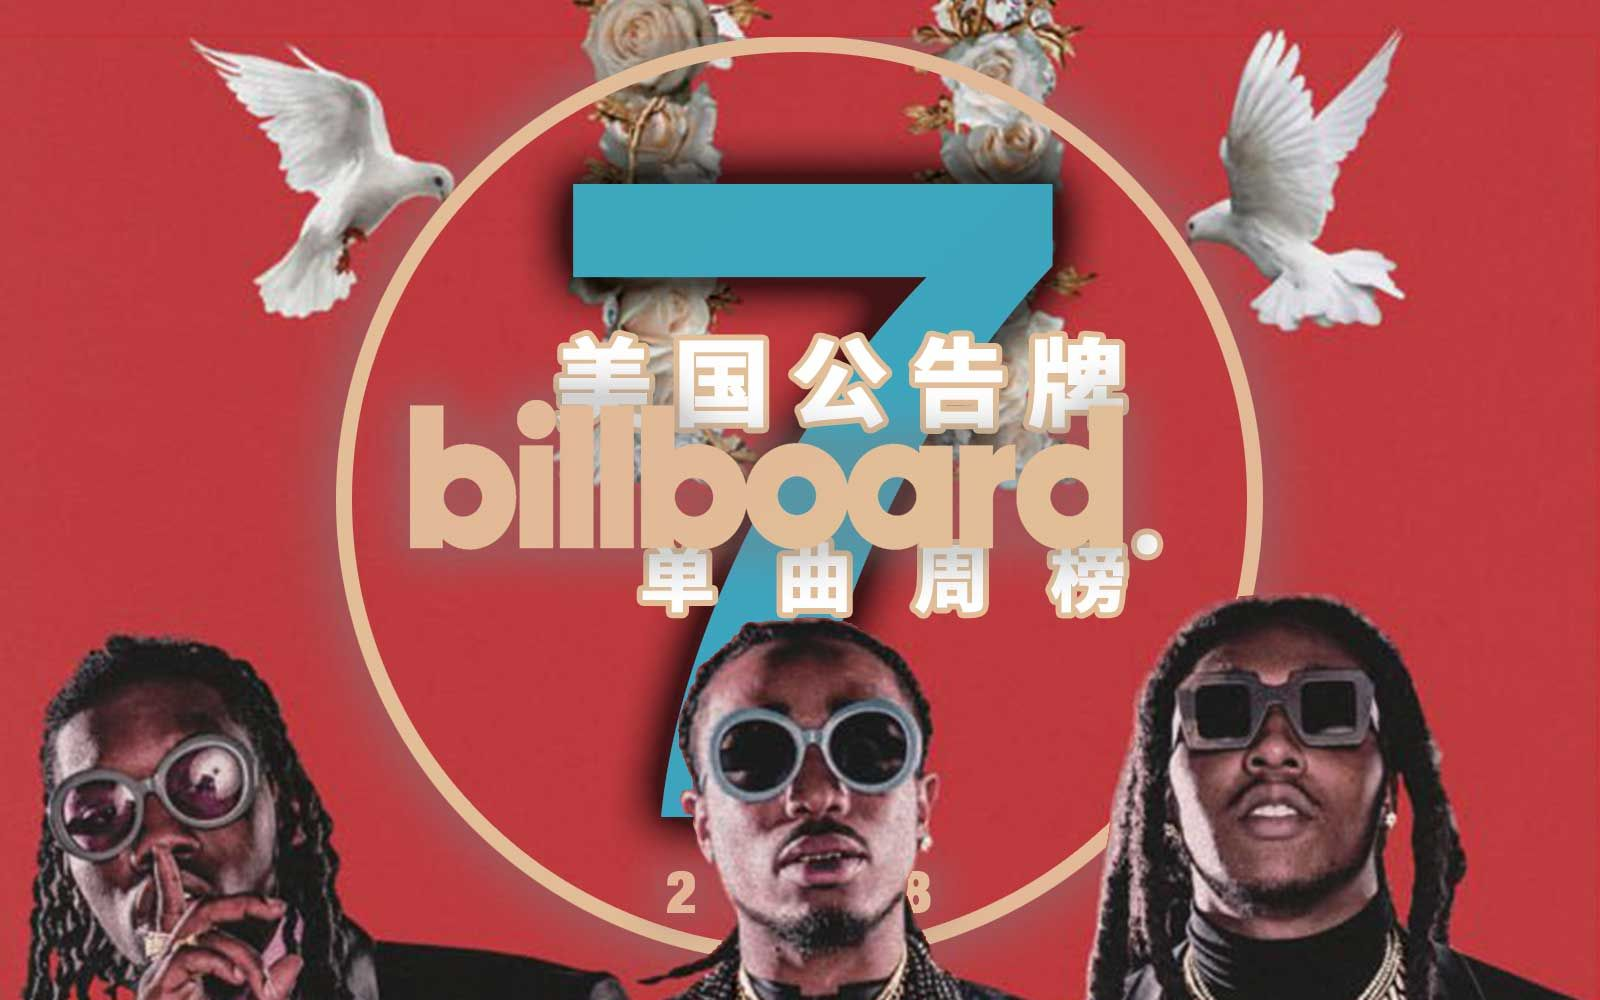 「木JJ出品」2018第7周 Billboard美国单曲周榜 &时光机